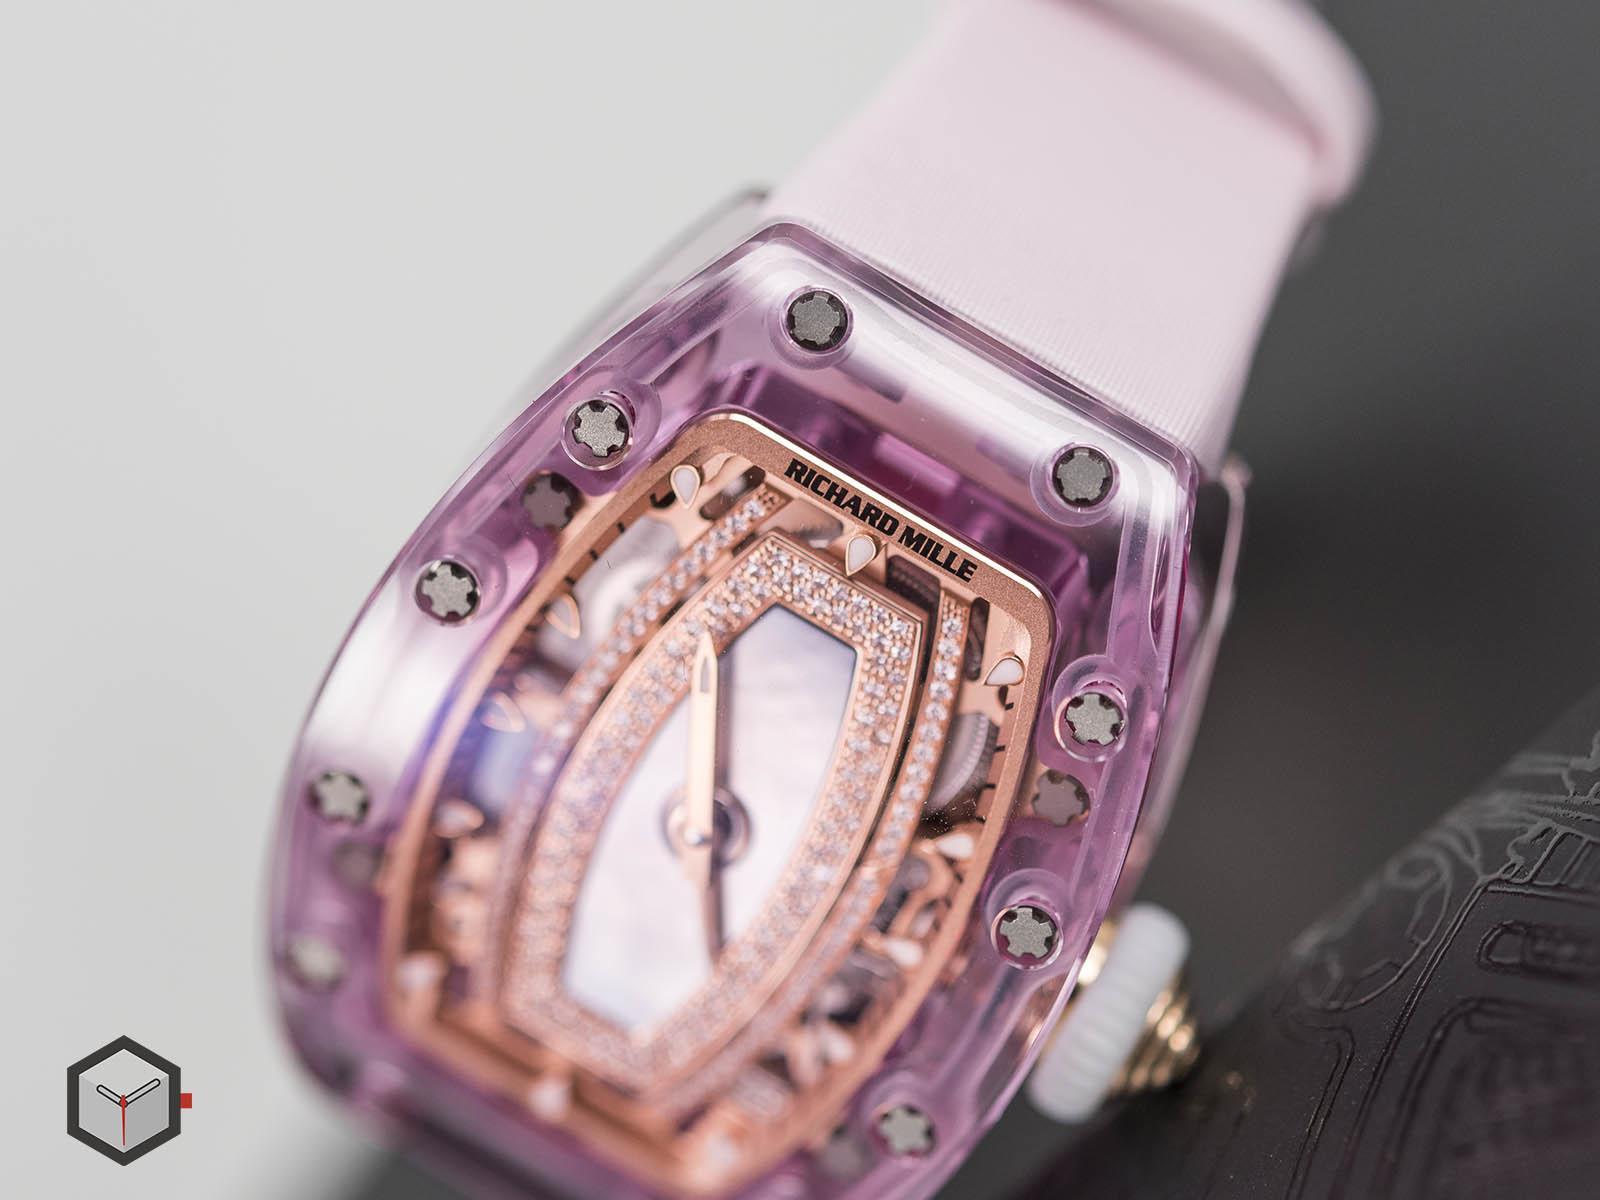 Lý Nhã Kỳ tái xuất khoe đồng hồ 28 tỷ đồng ai cũng